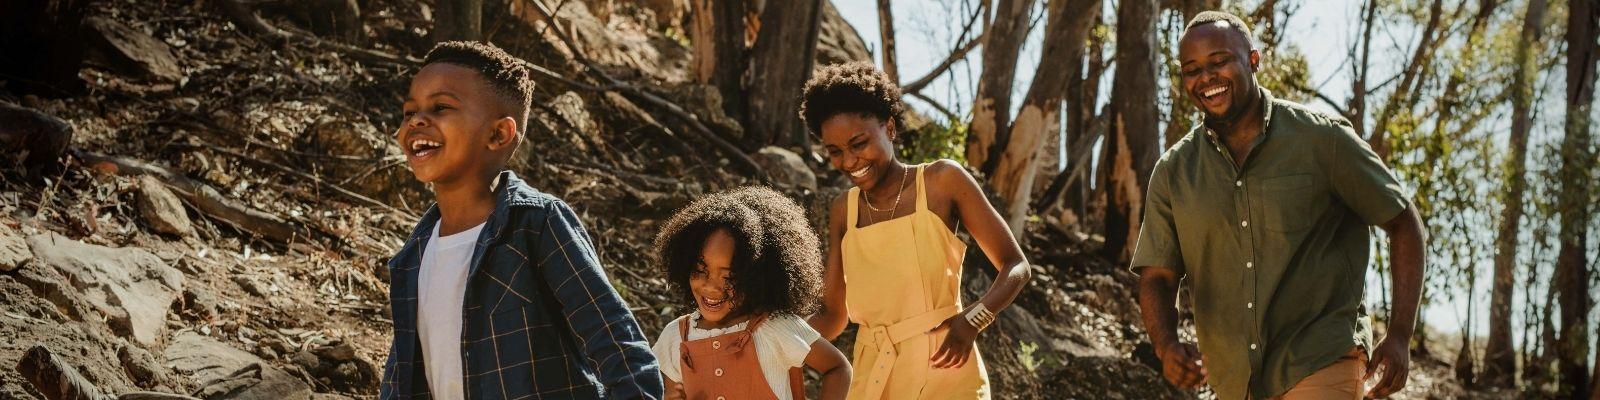 Young family enjoys a national park.